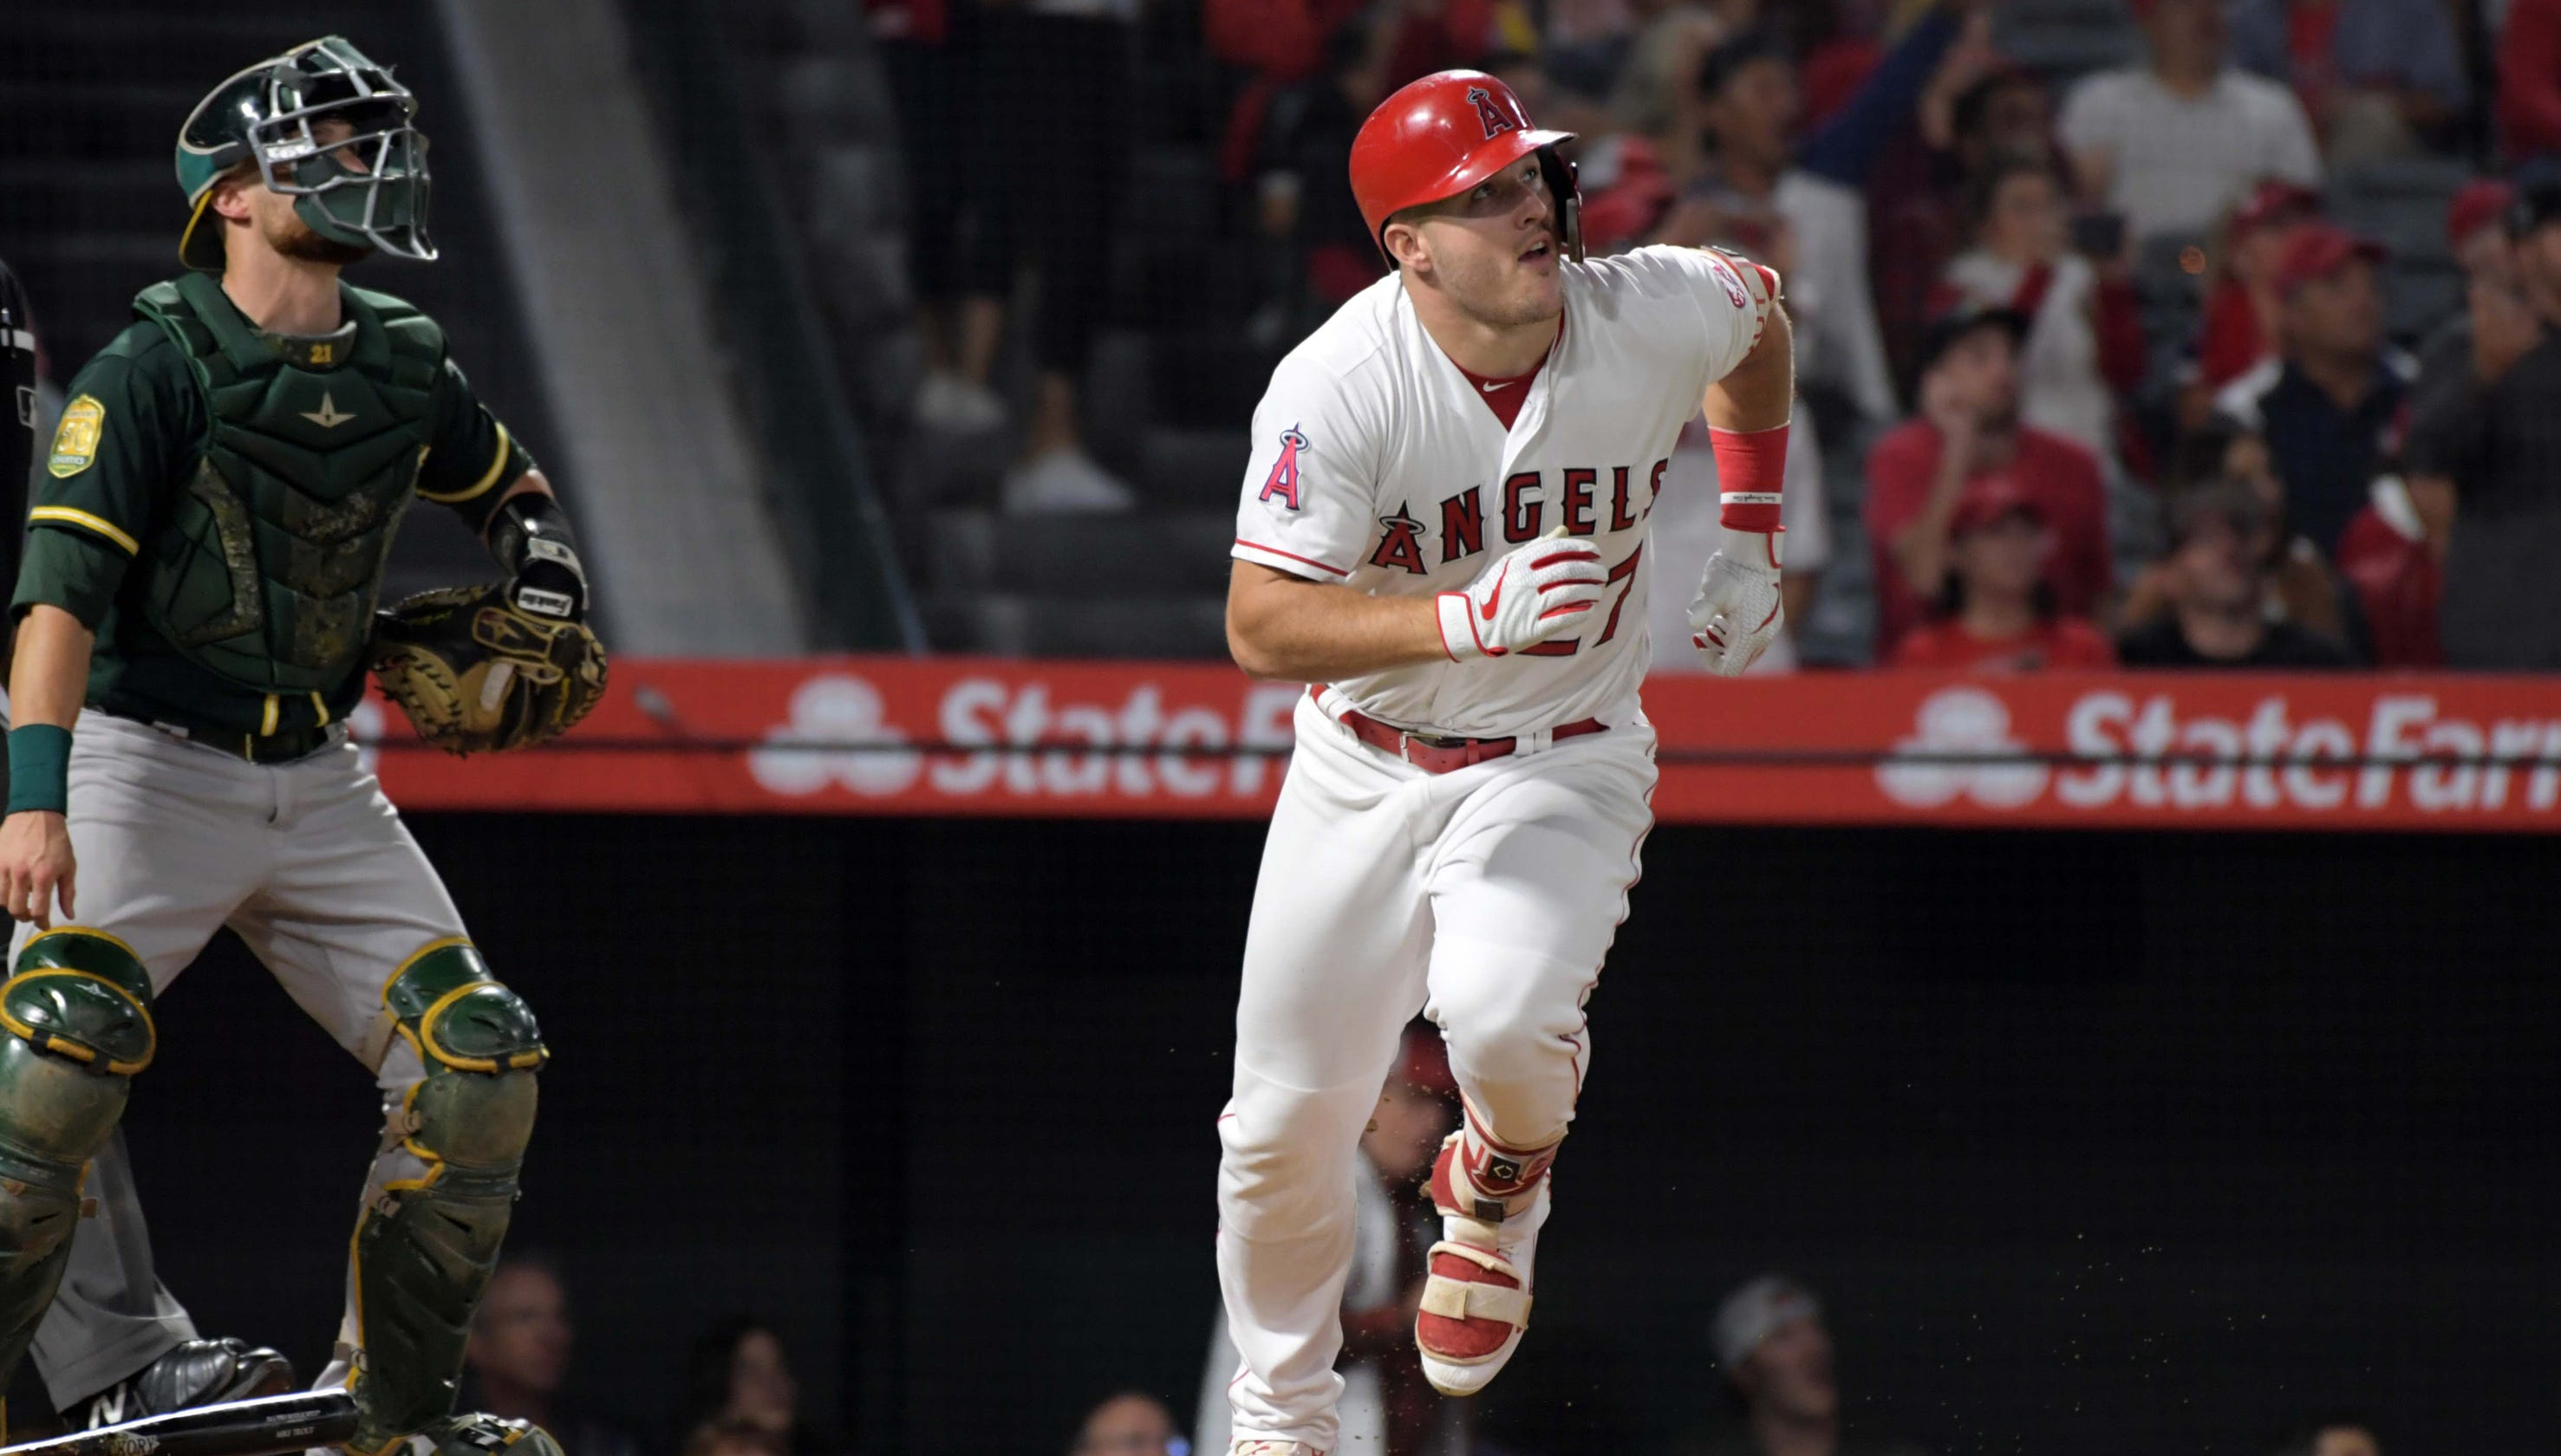 Mlbs Highest Paid Players Rankings 2019 Major League